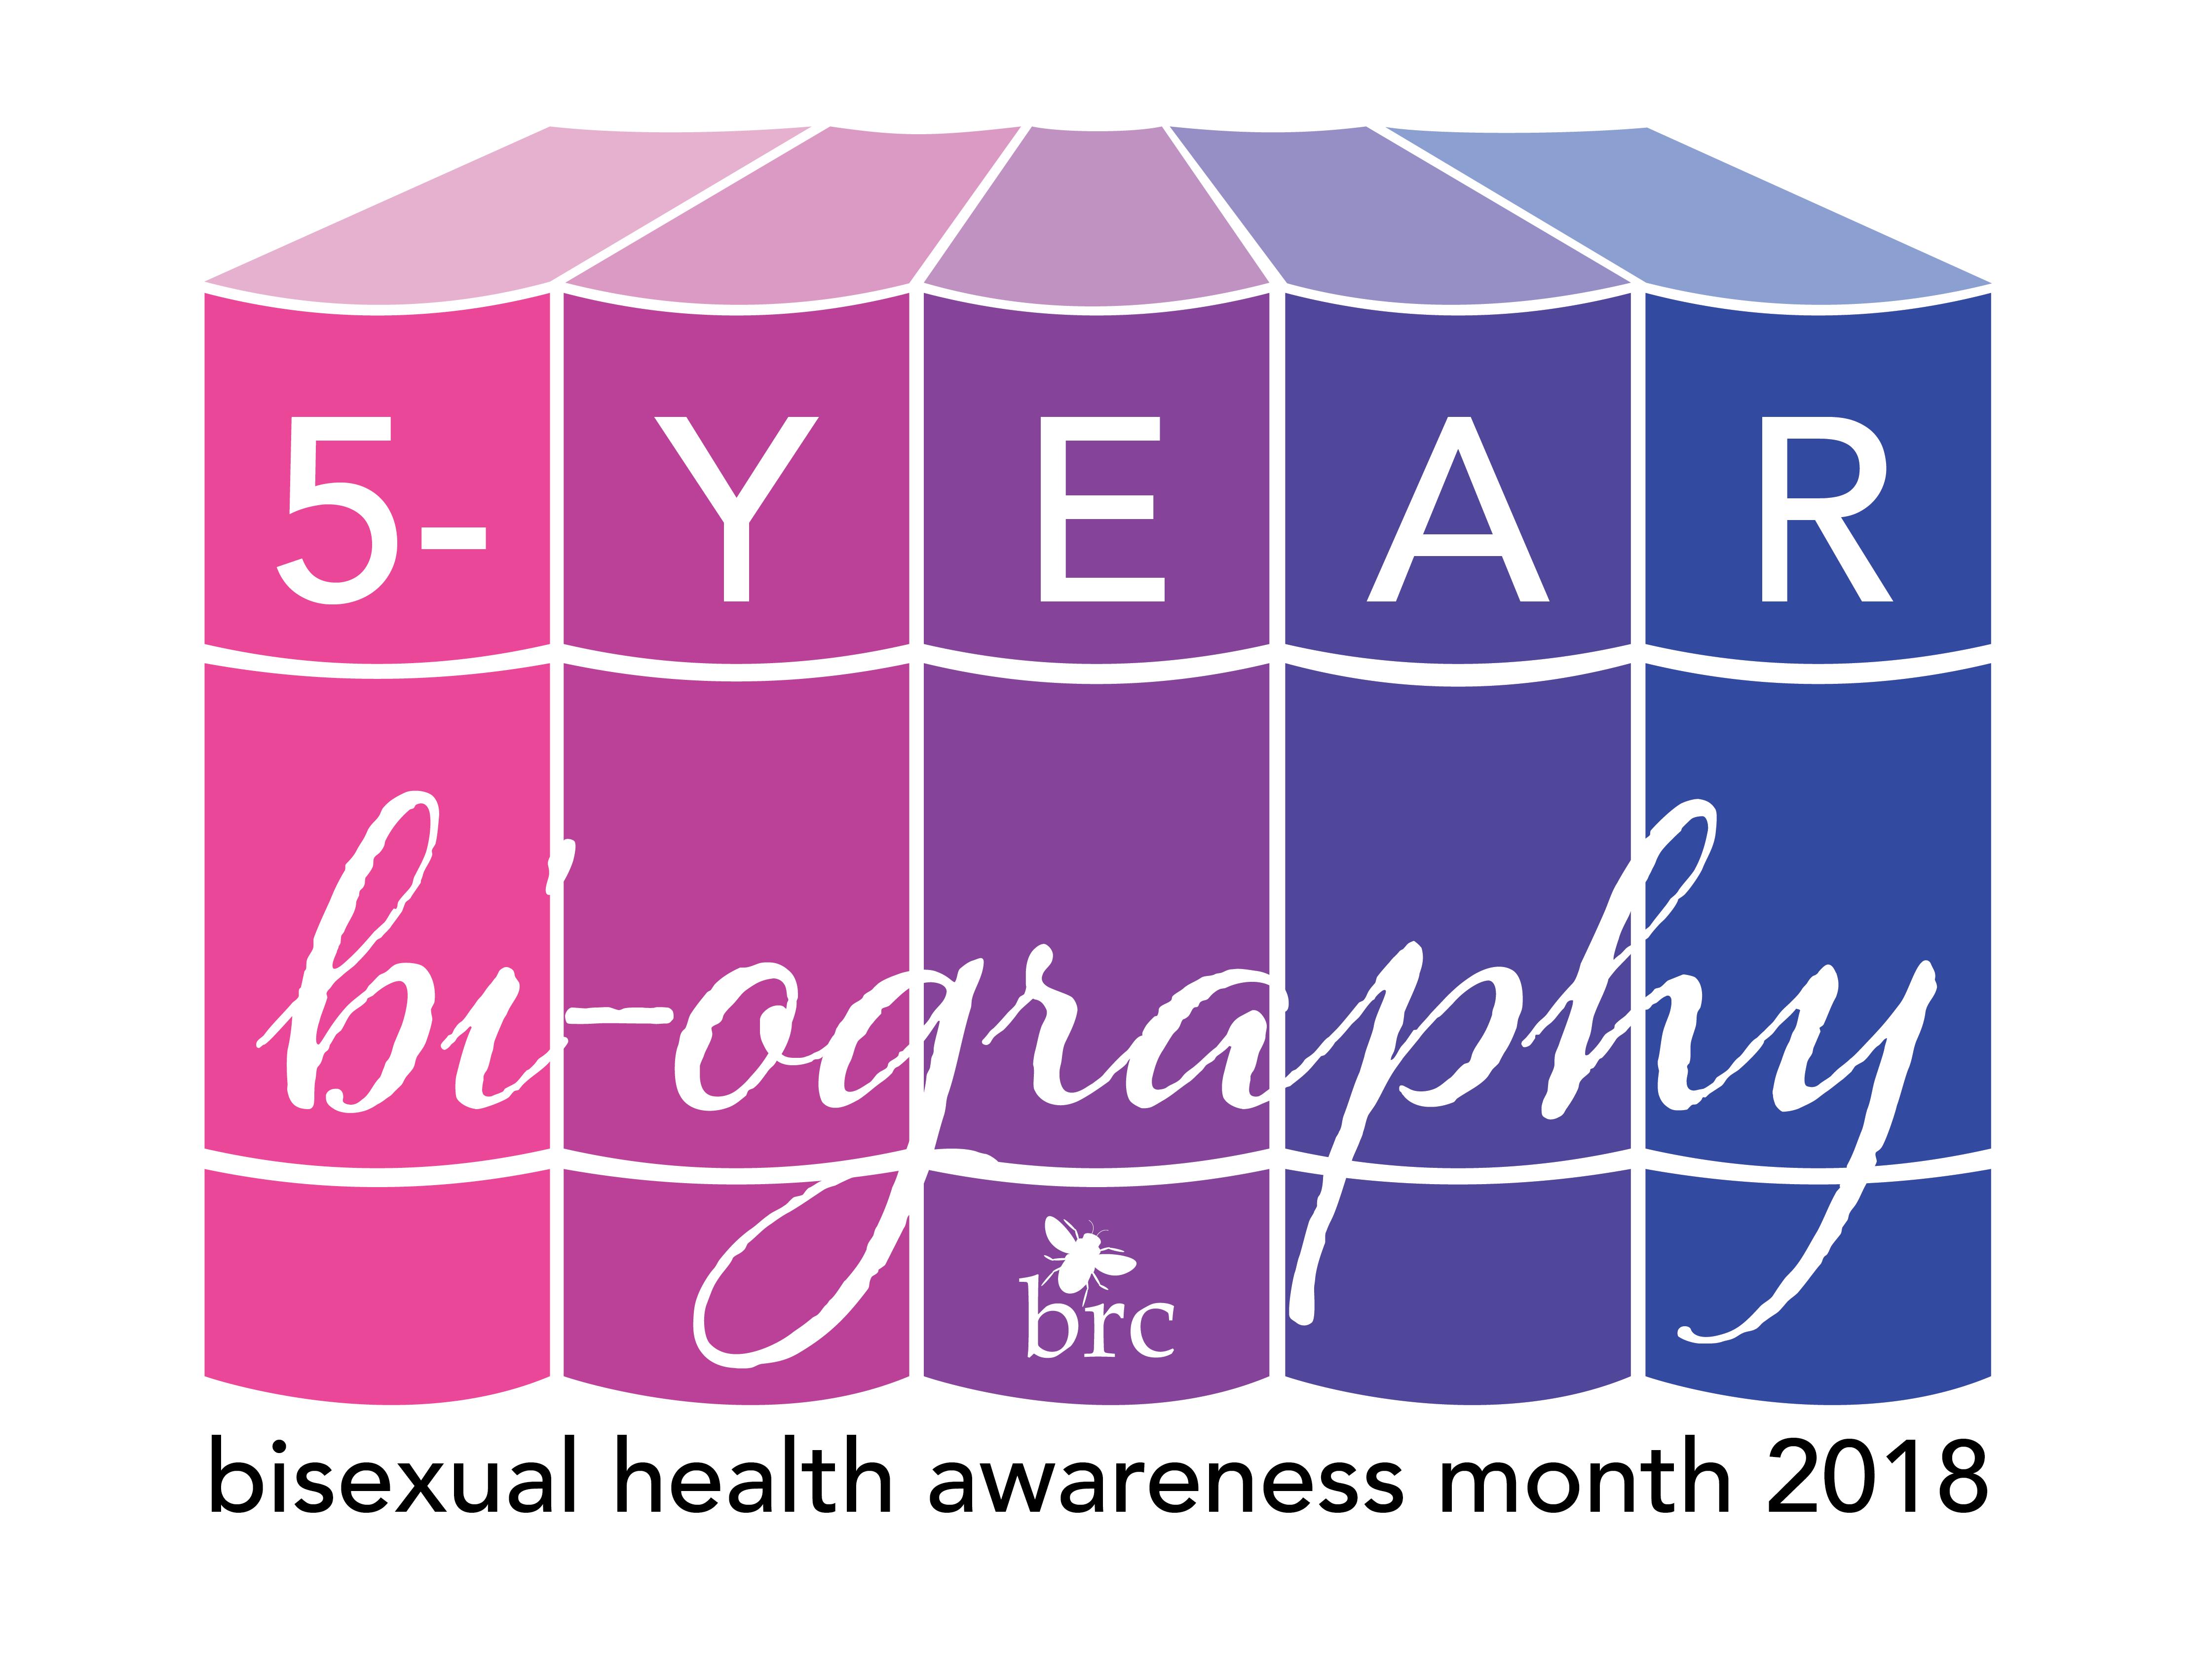 Characteristics of bisexual